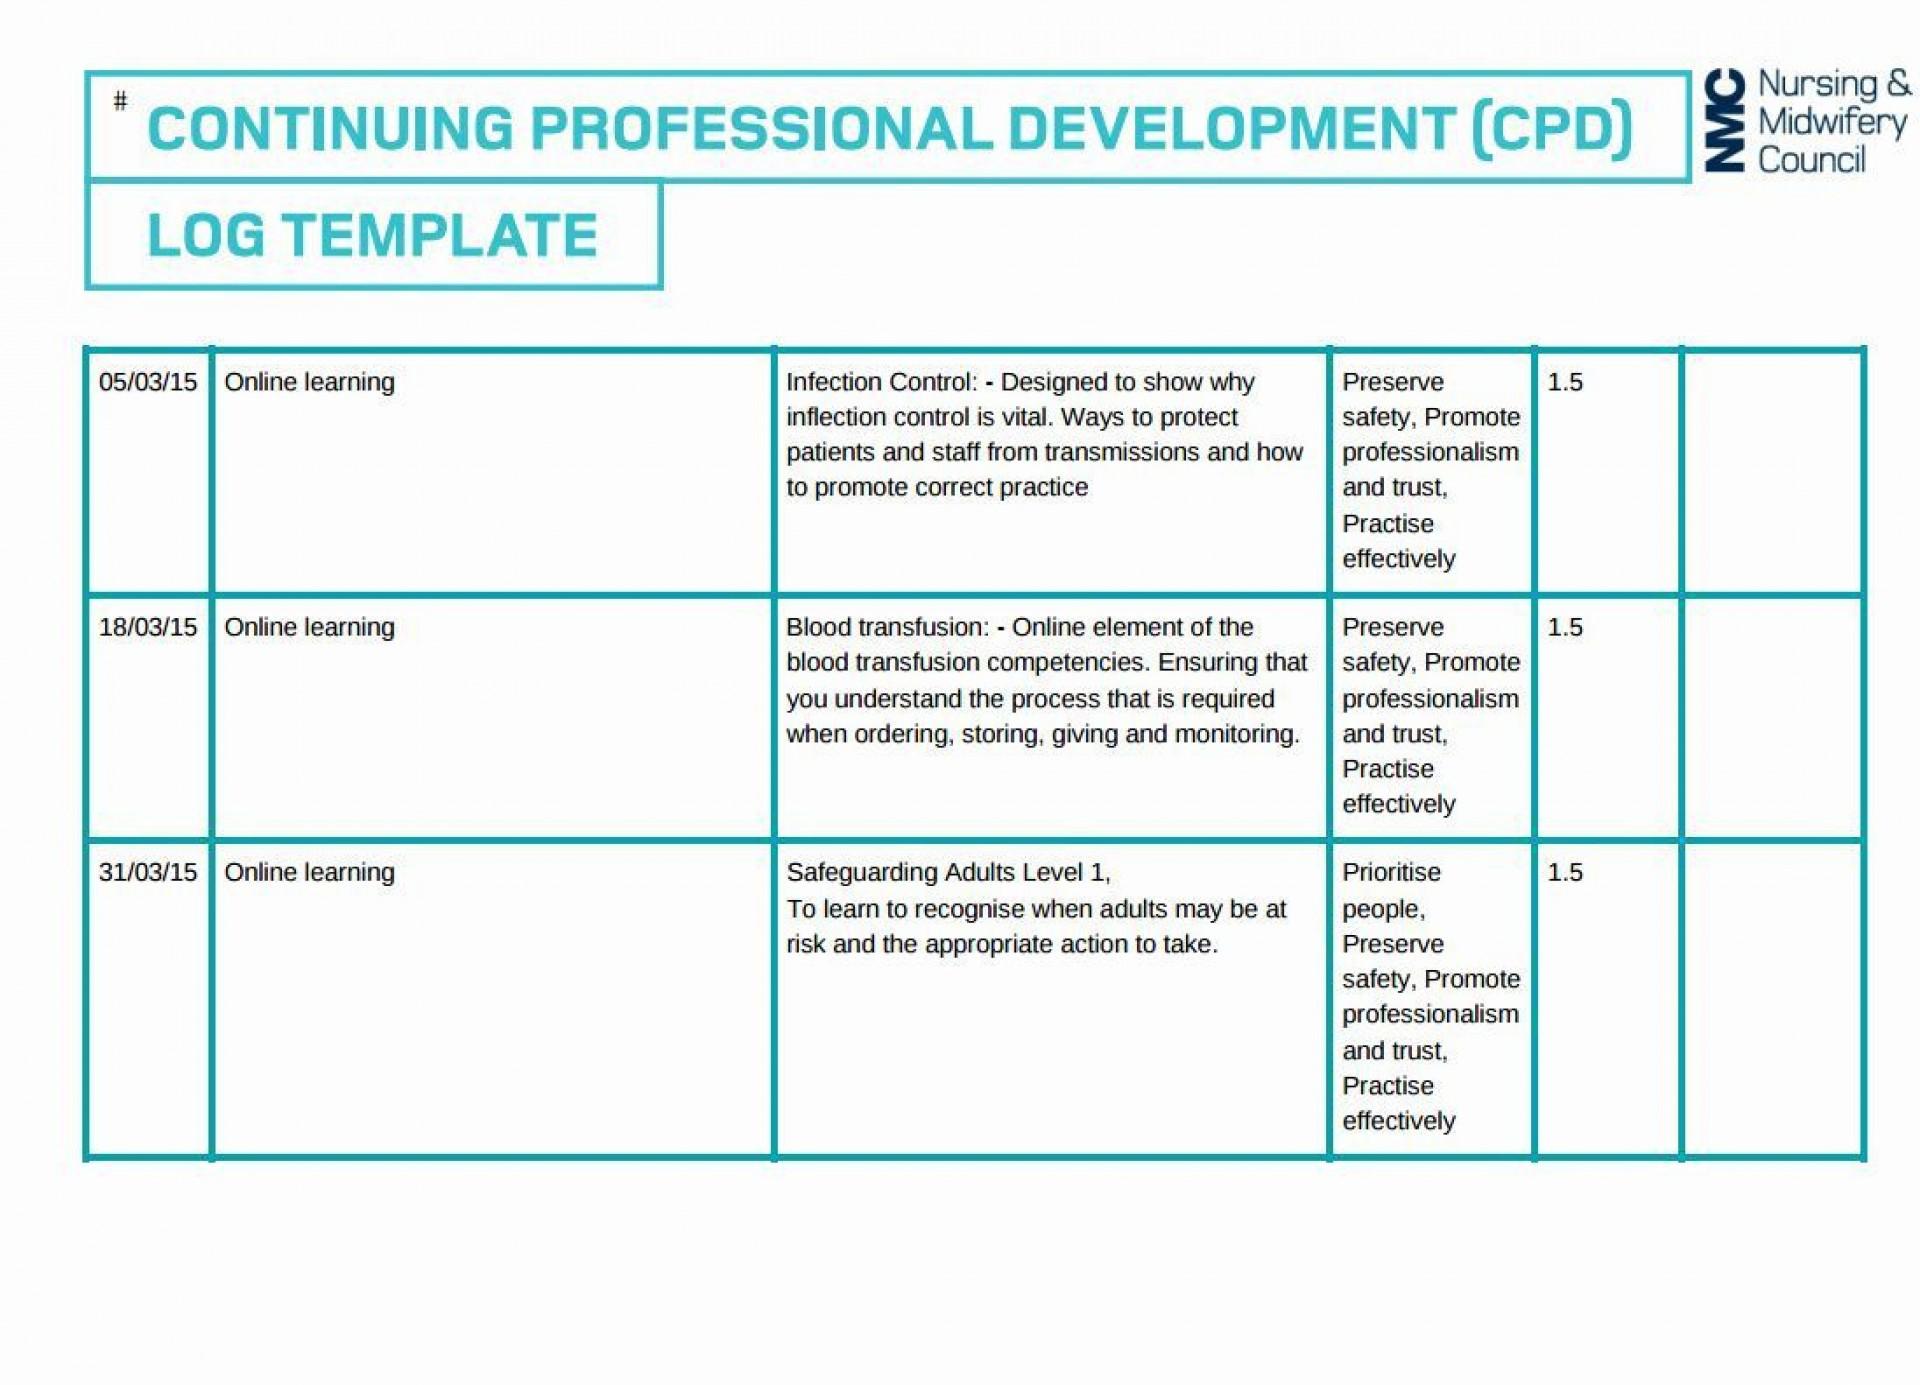 004 Staggering Professional Development Plan Template For Nurse High Def  Nurses Sample Goal Example1920